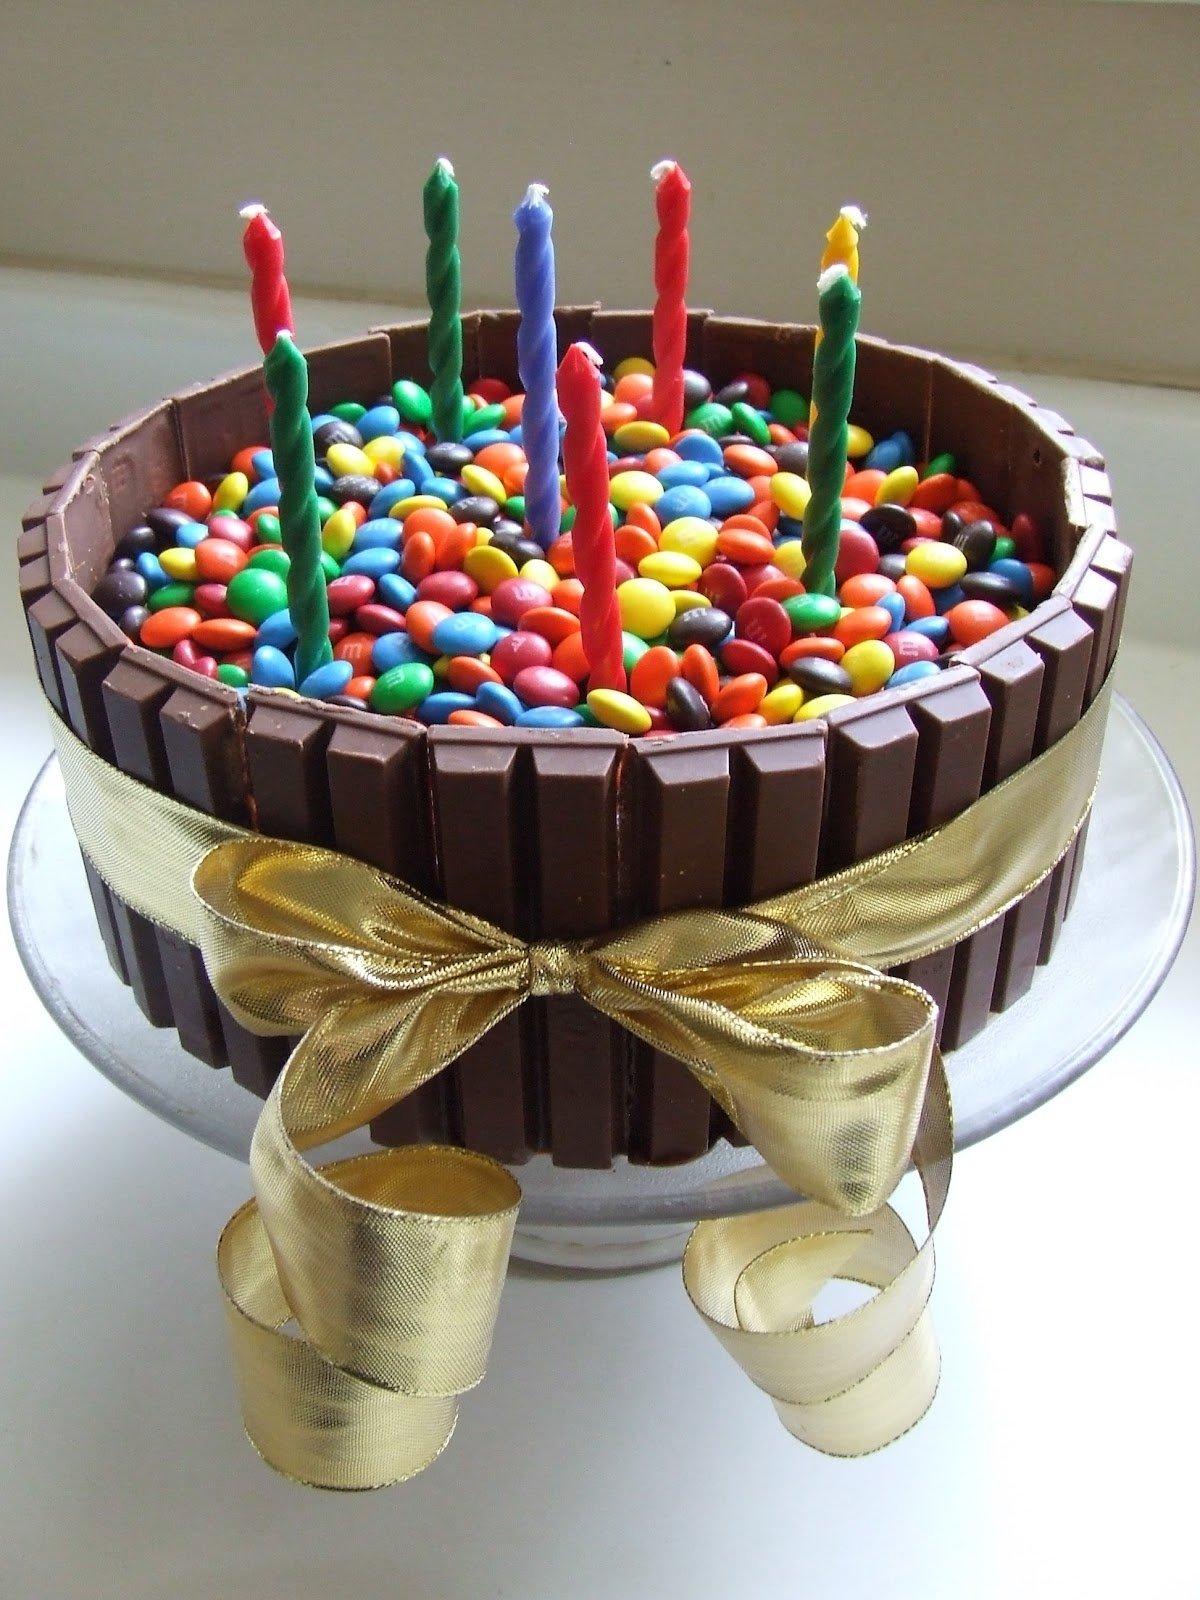 10 Stylish 14 Year Old Boy Birthday Party Ideas Cake For 15